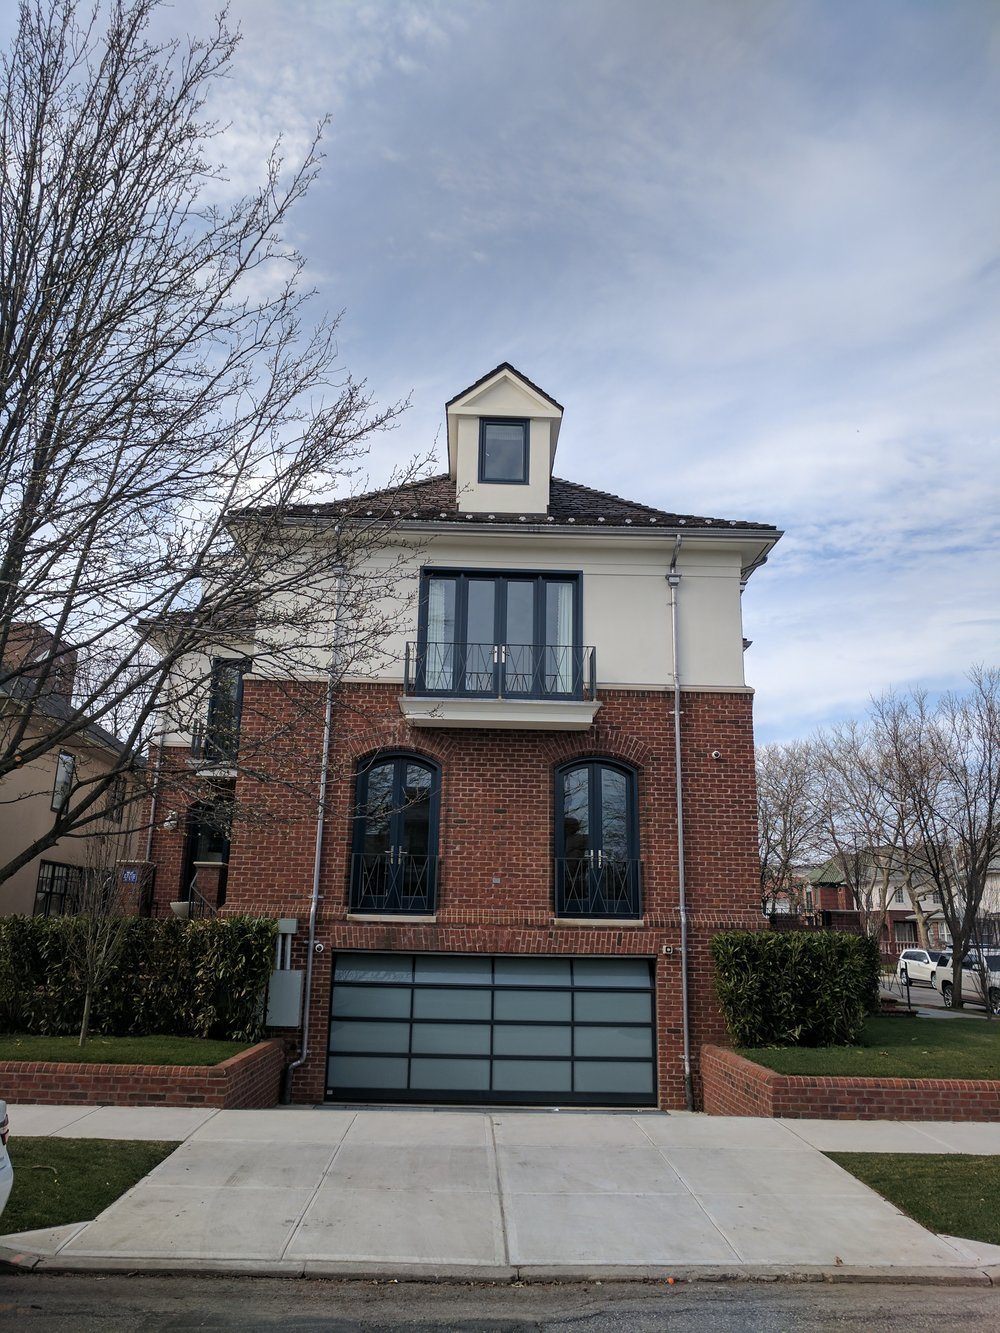 Custom Windows for a Brooklyn Home